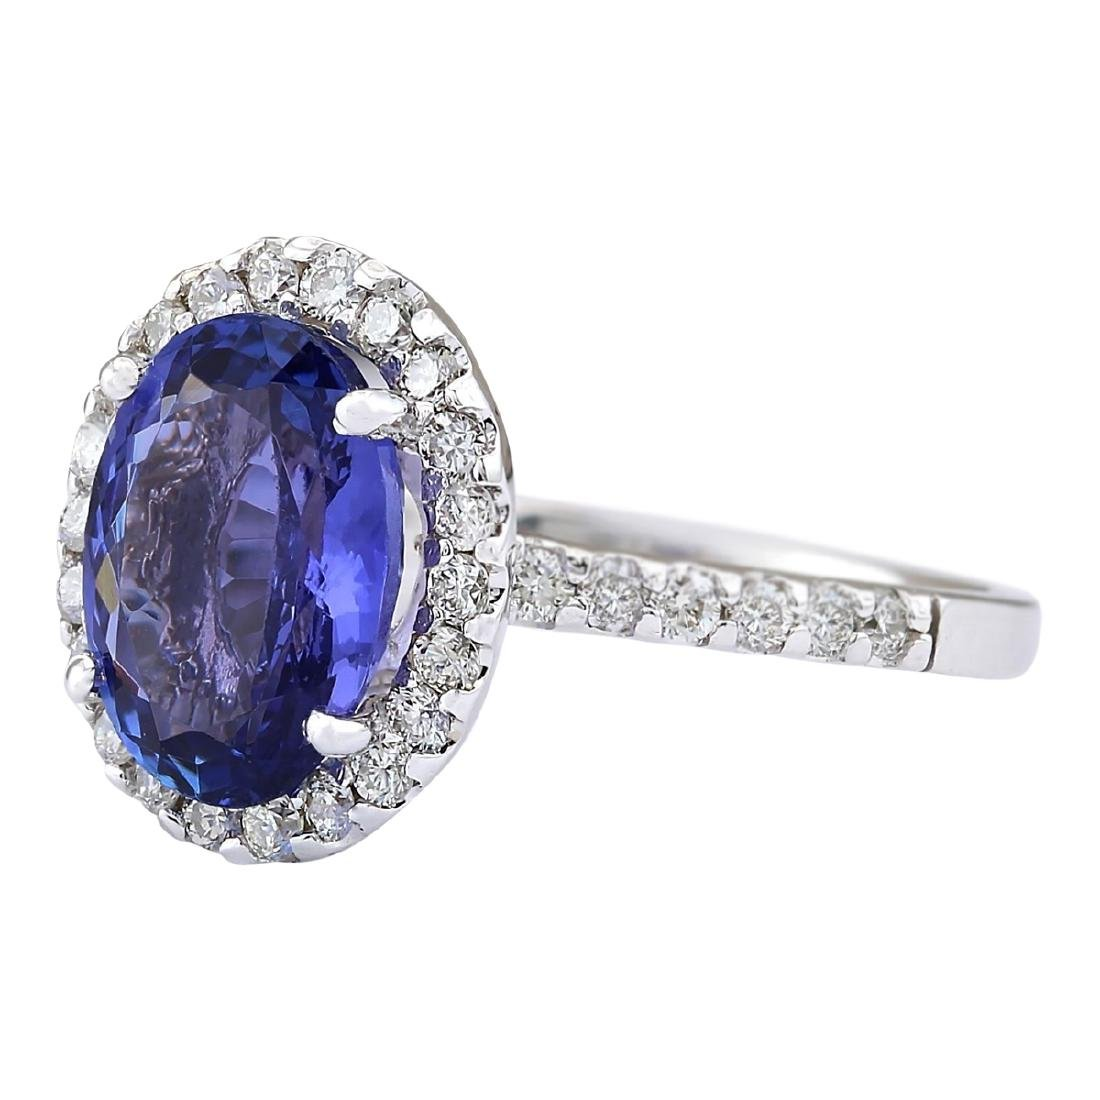 3.63 CTW Natural Blue Tanzanite And Diamond Ring 18K - 2